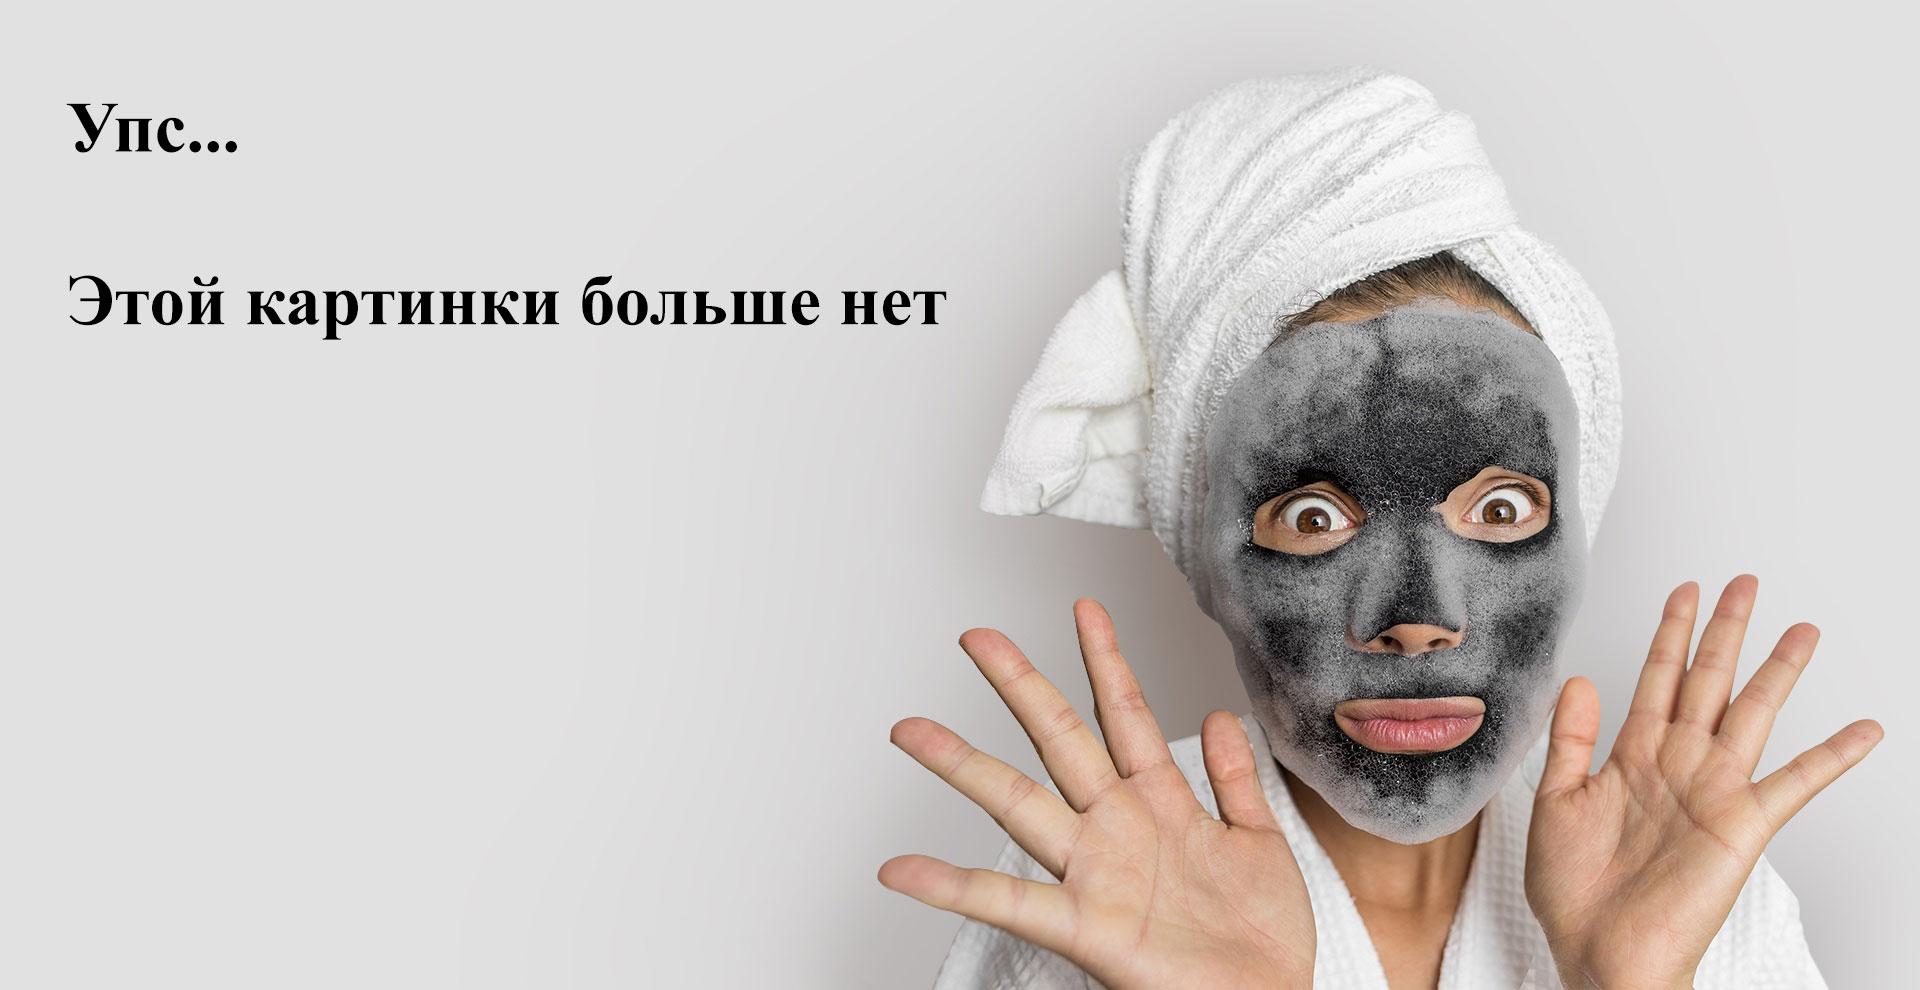 Enough, Тональный крем Ultra X10 Cover Up Collagen №21, SPF 50+, 100 мл